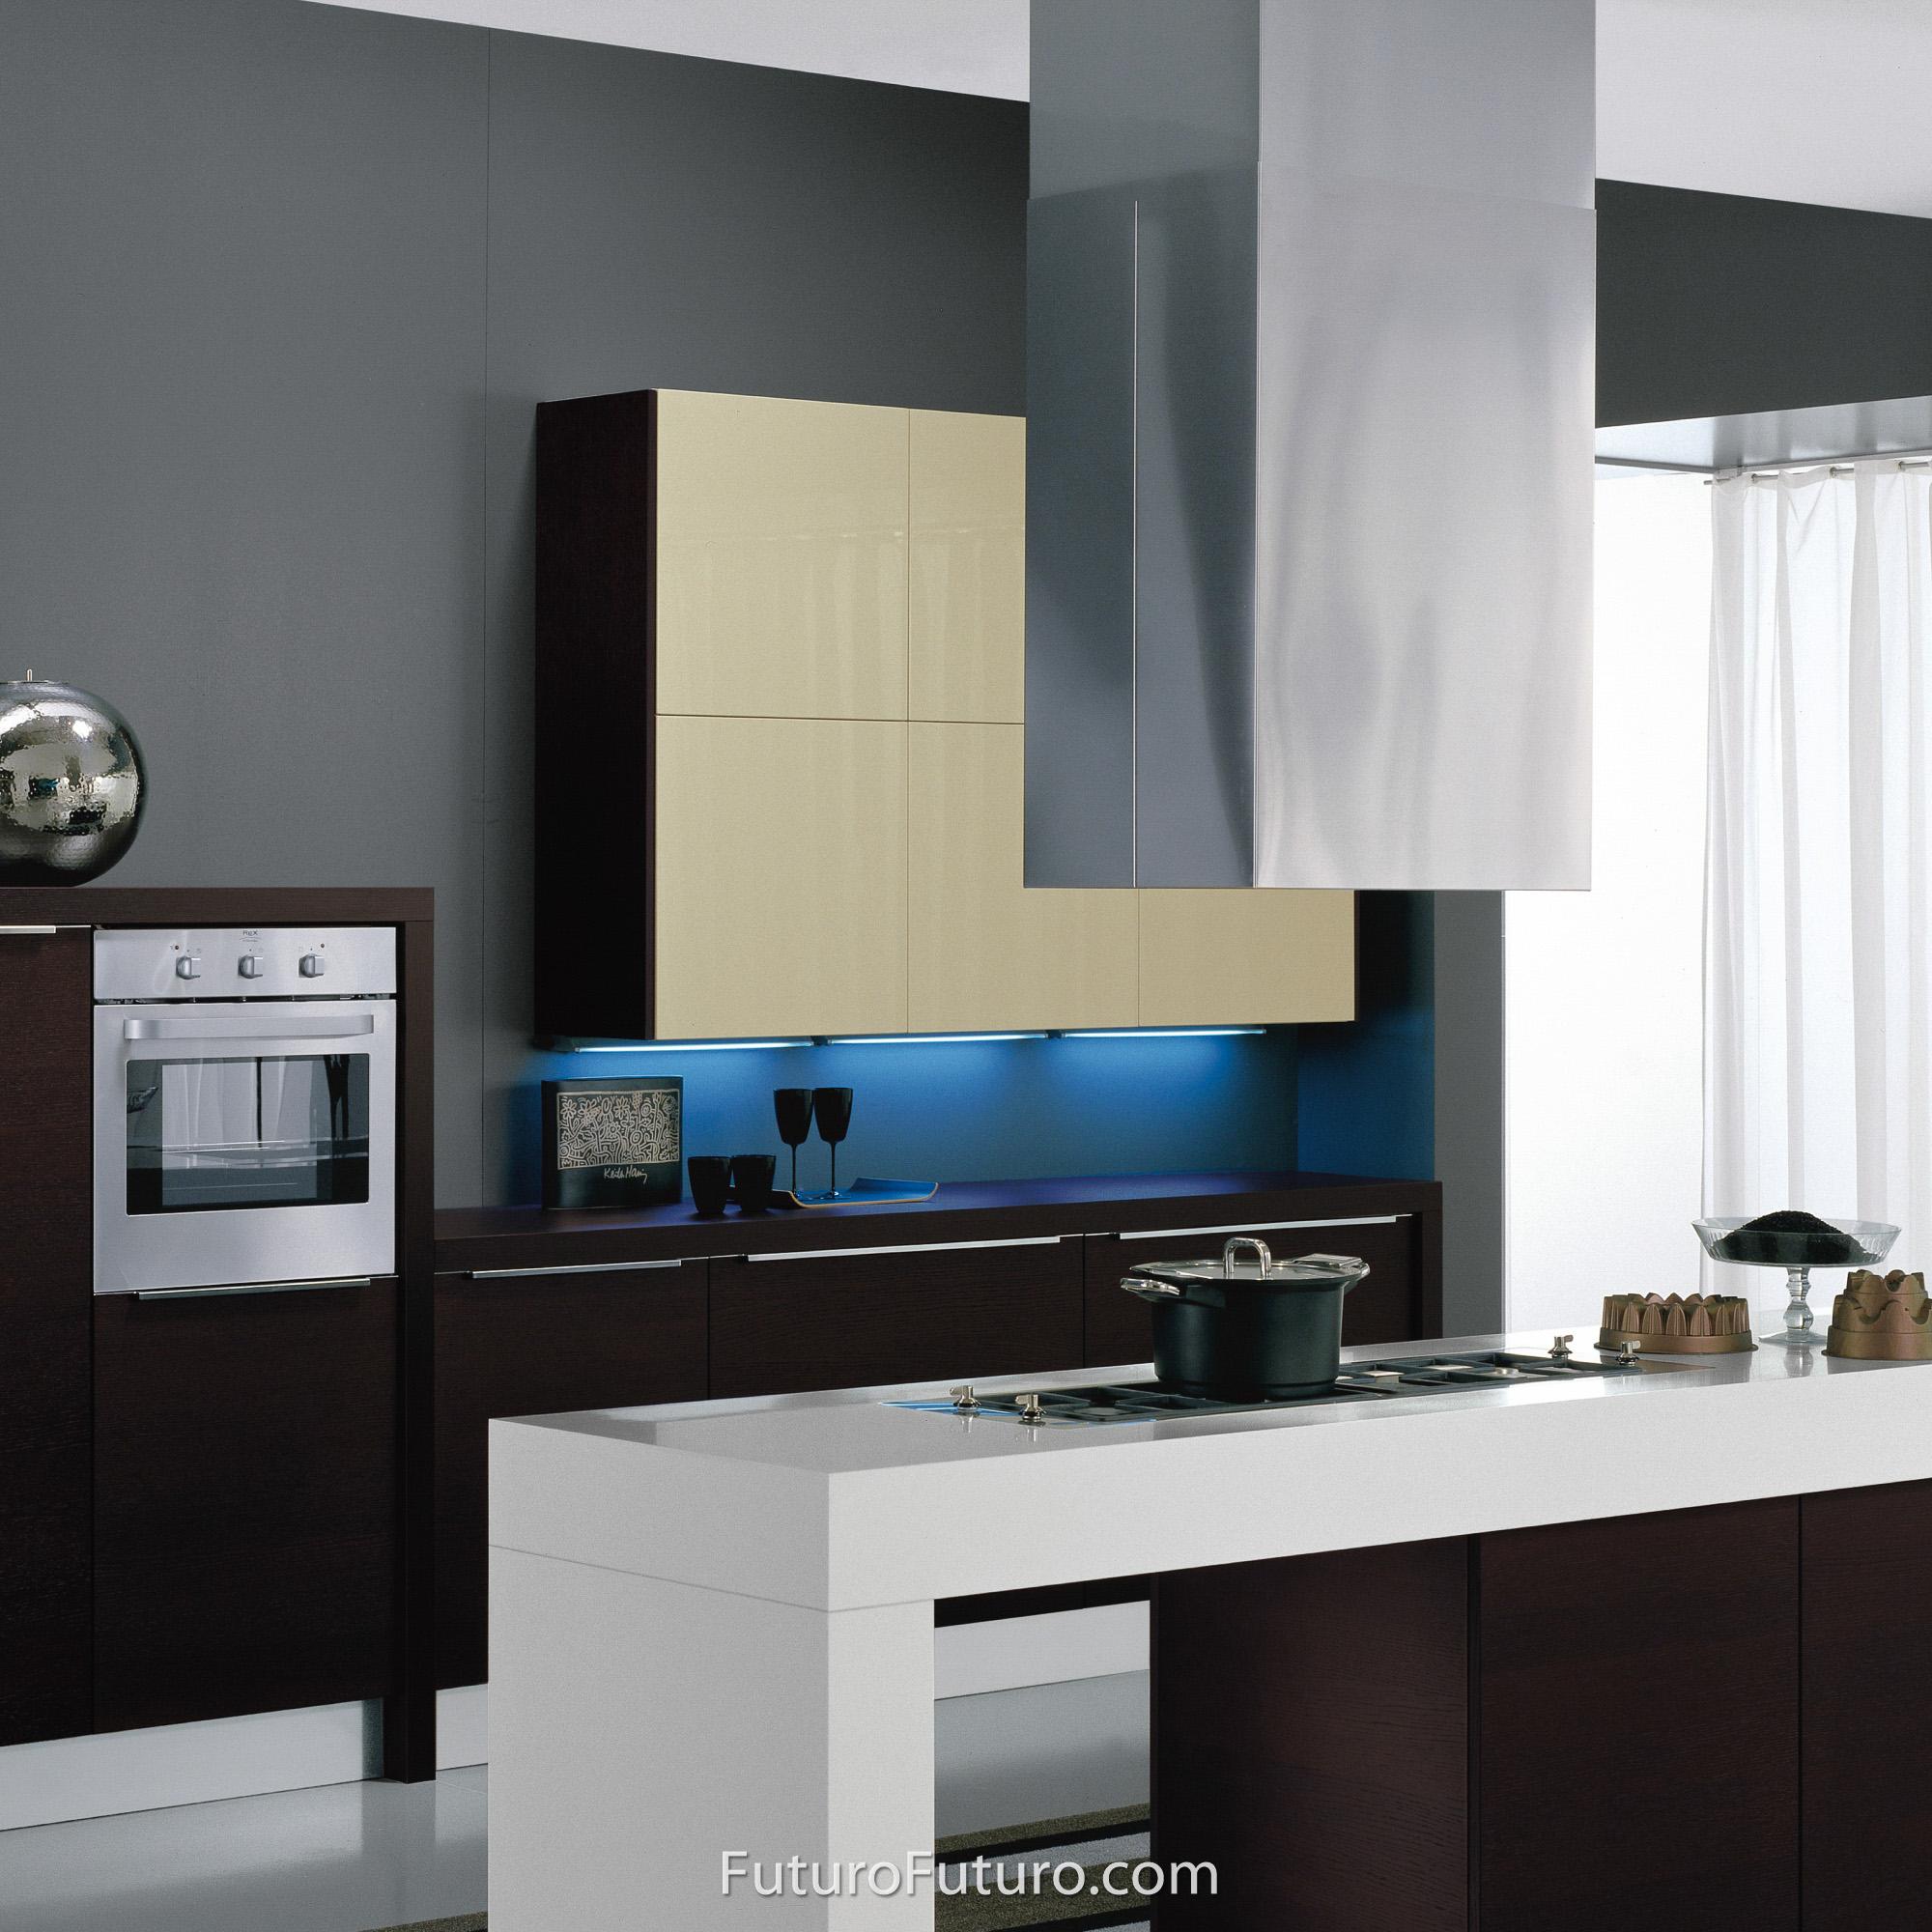 range hood 24 inch amalfi island by futuro futuro